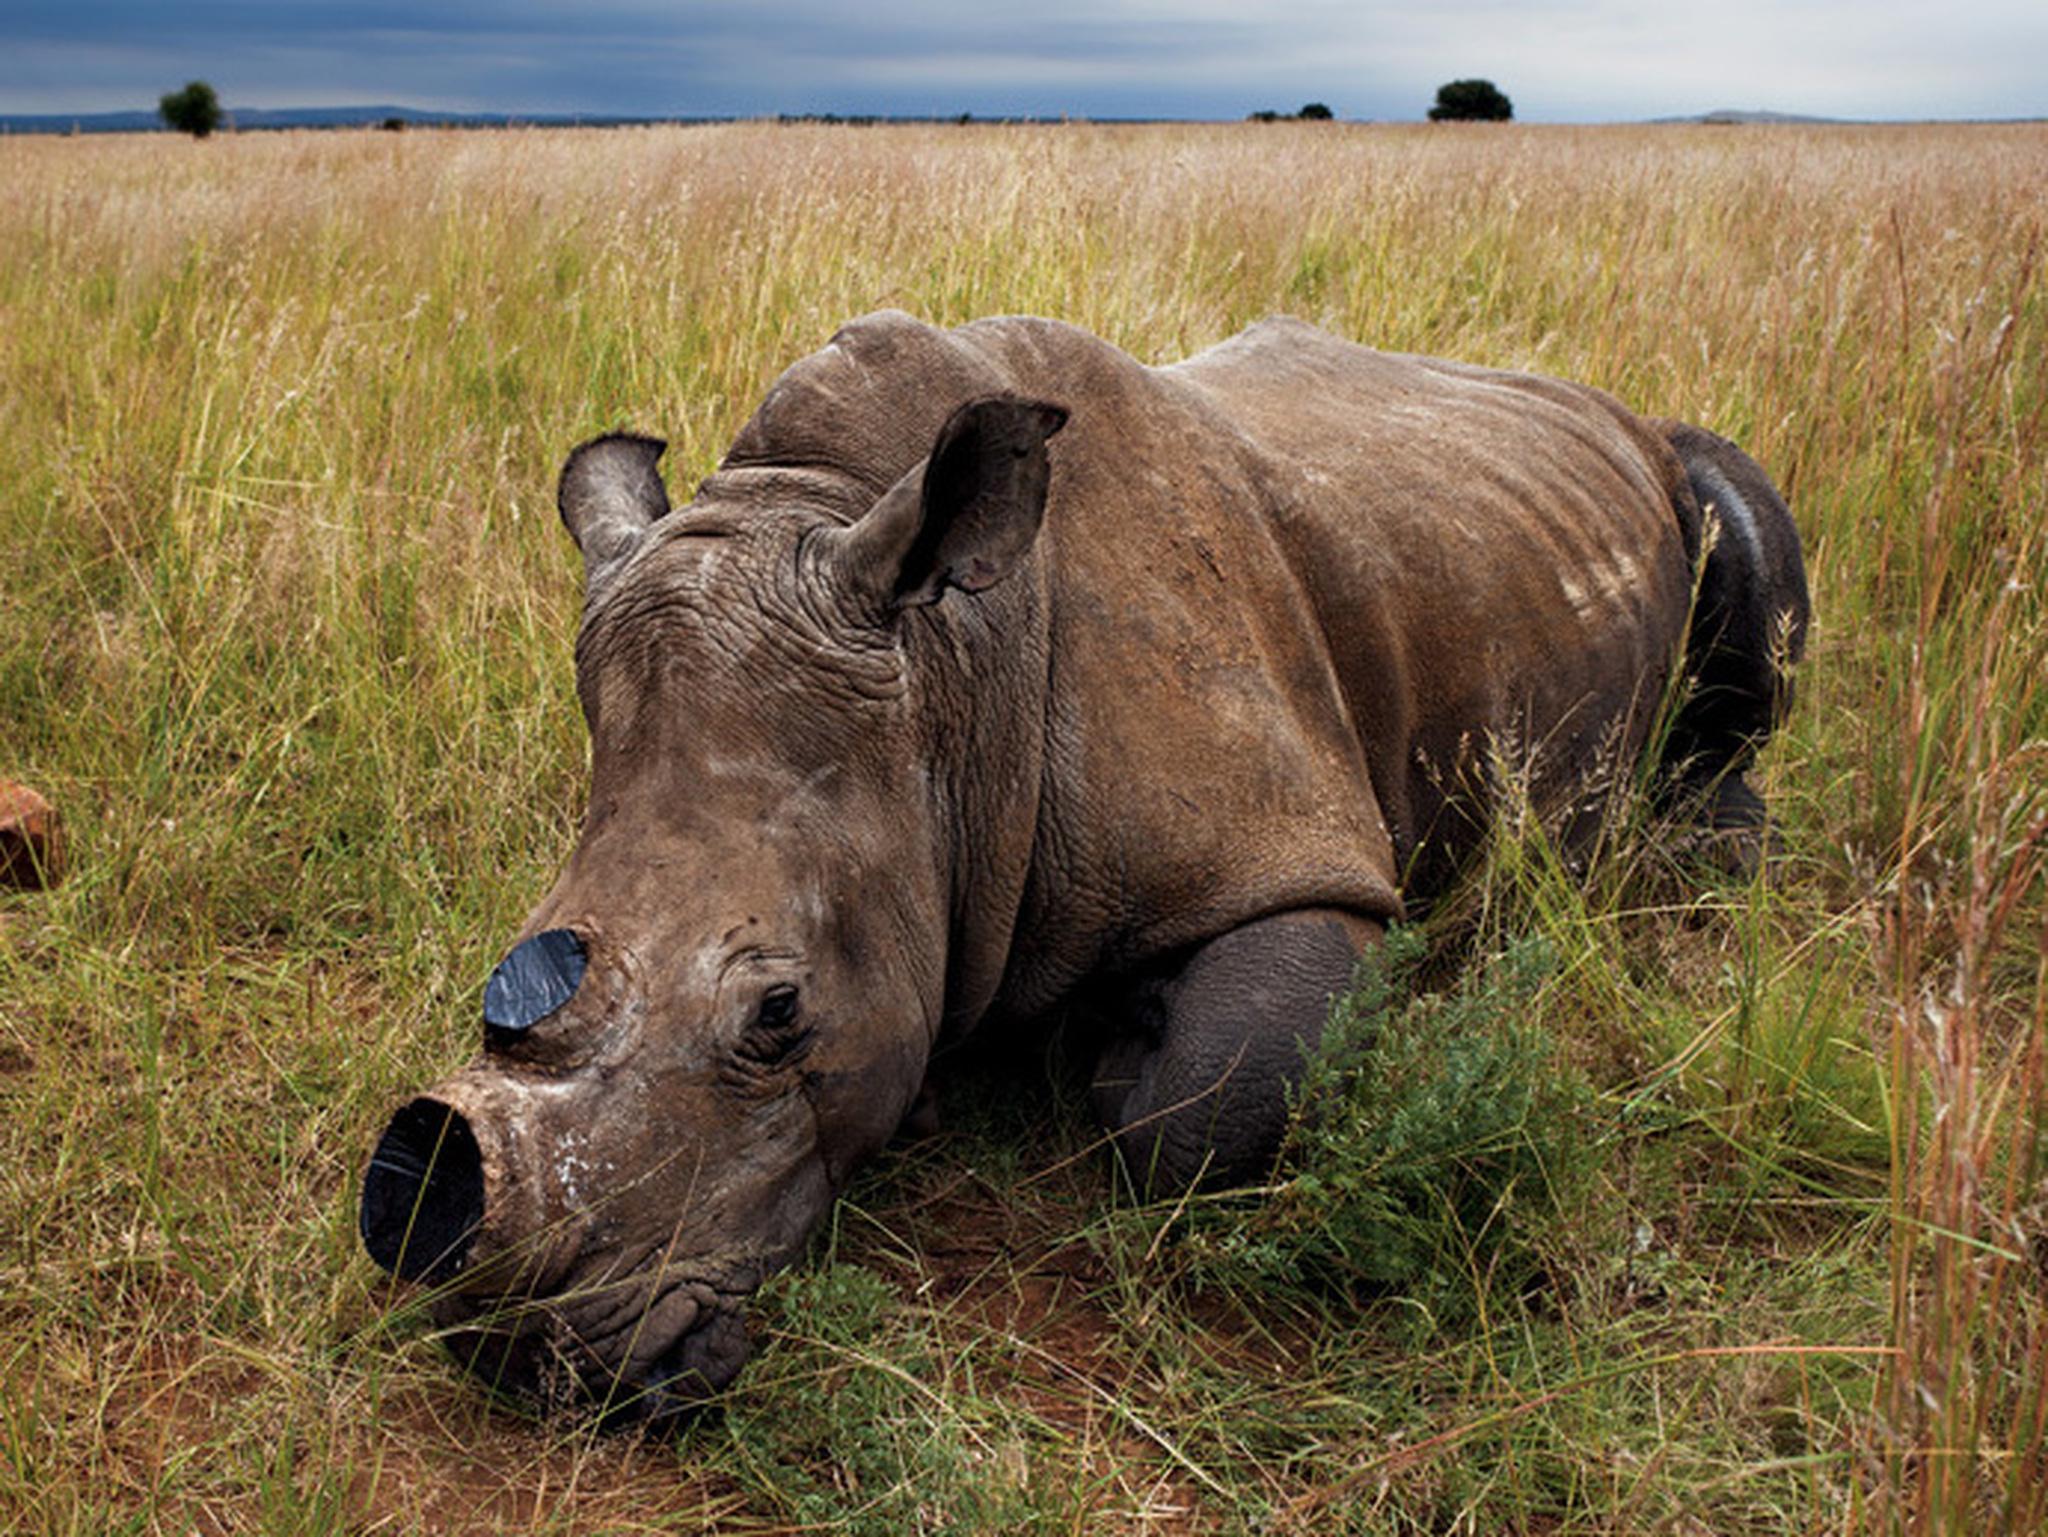 Drawn rhino battle Rhino For after to decrease